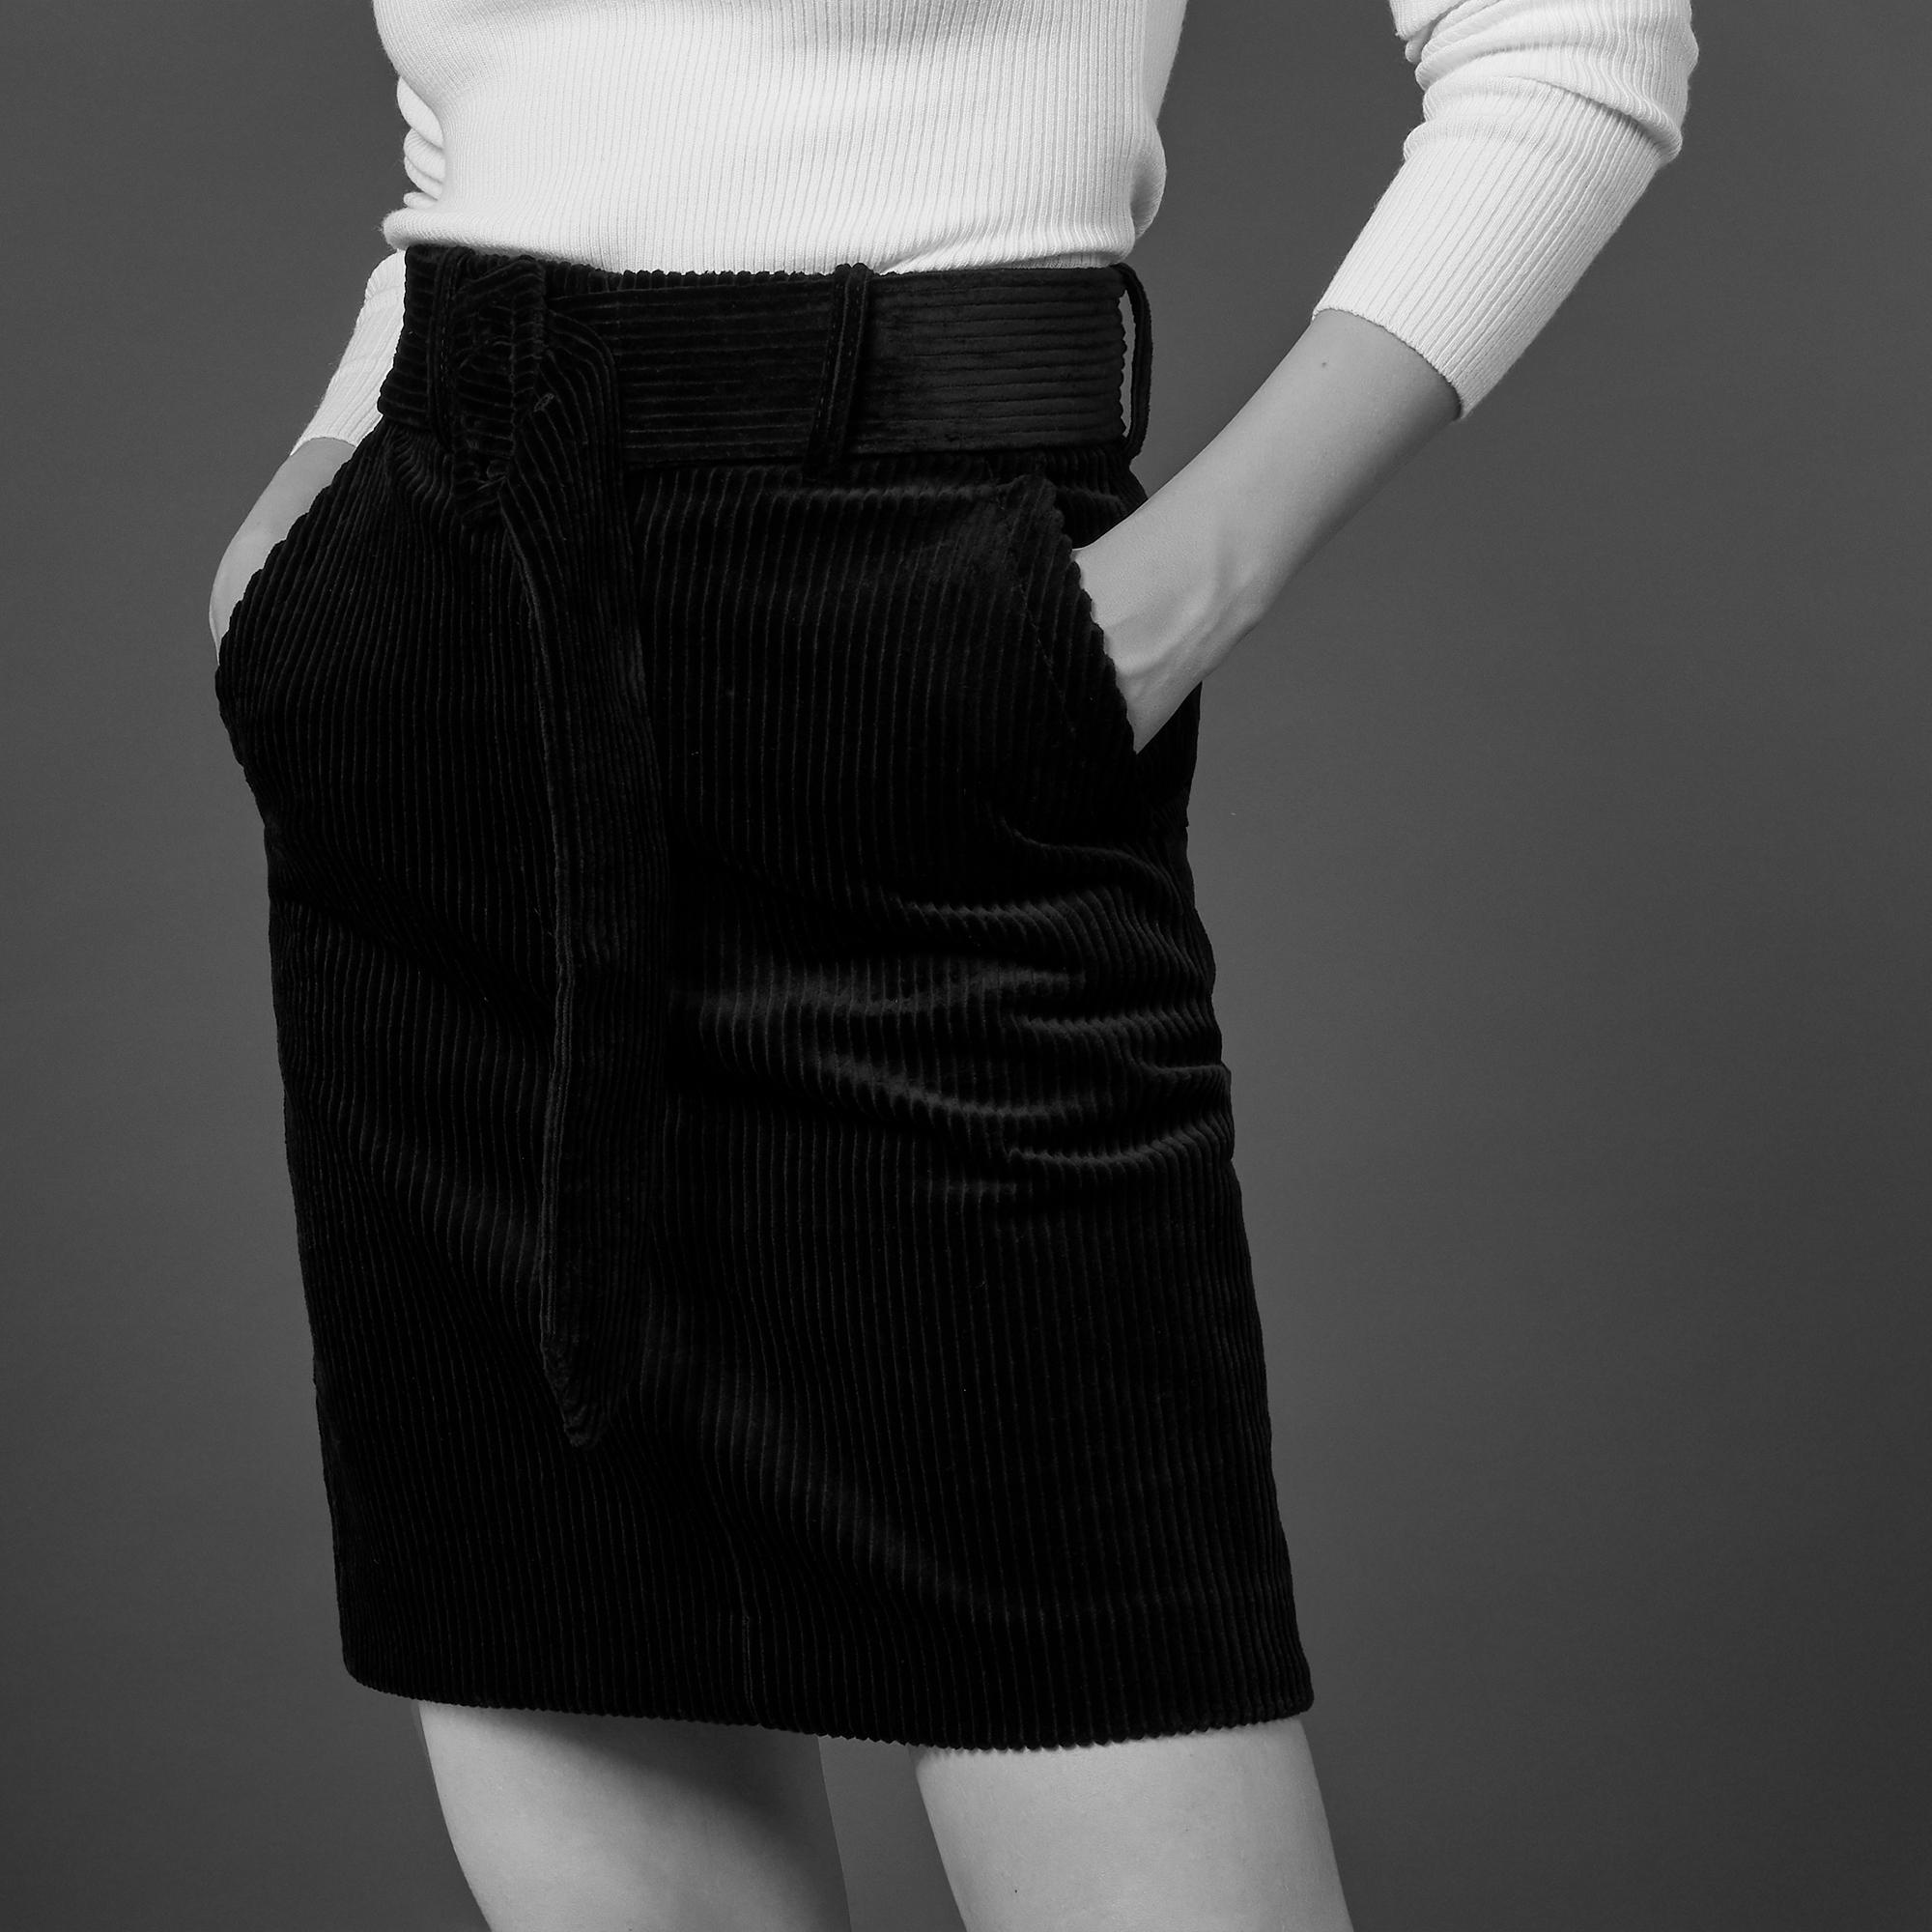 031b31abbd Short corduroy skirt with belt